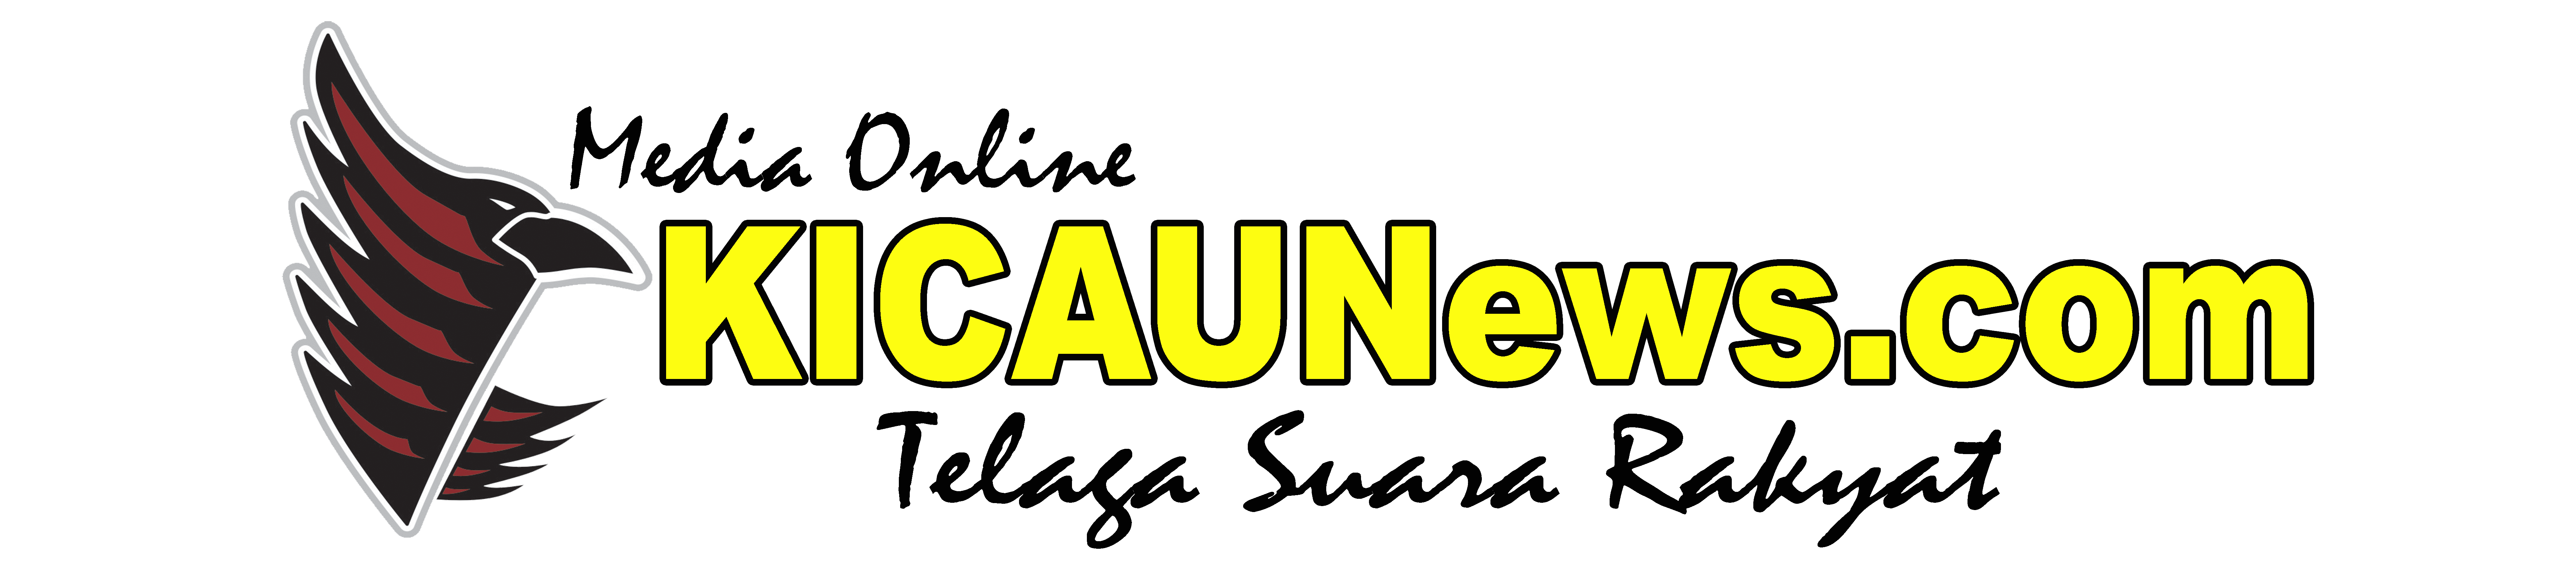 Kicau News